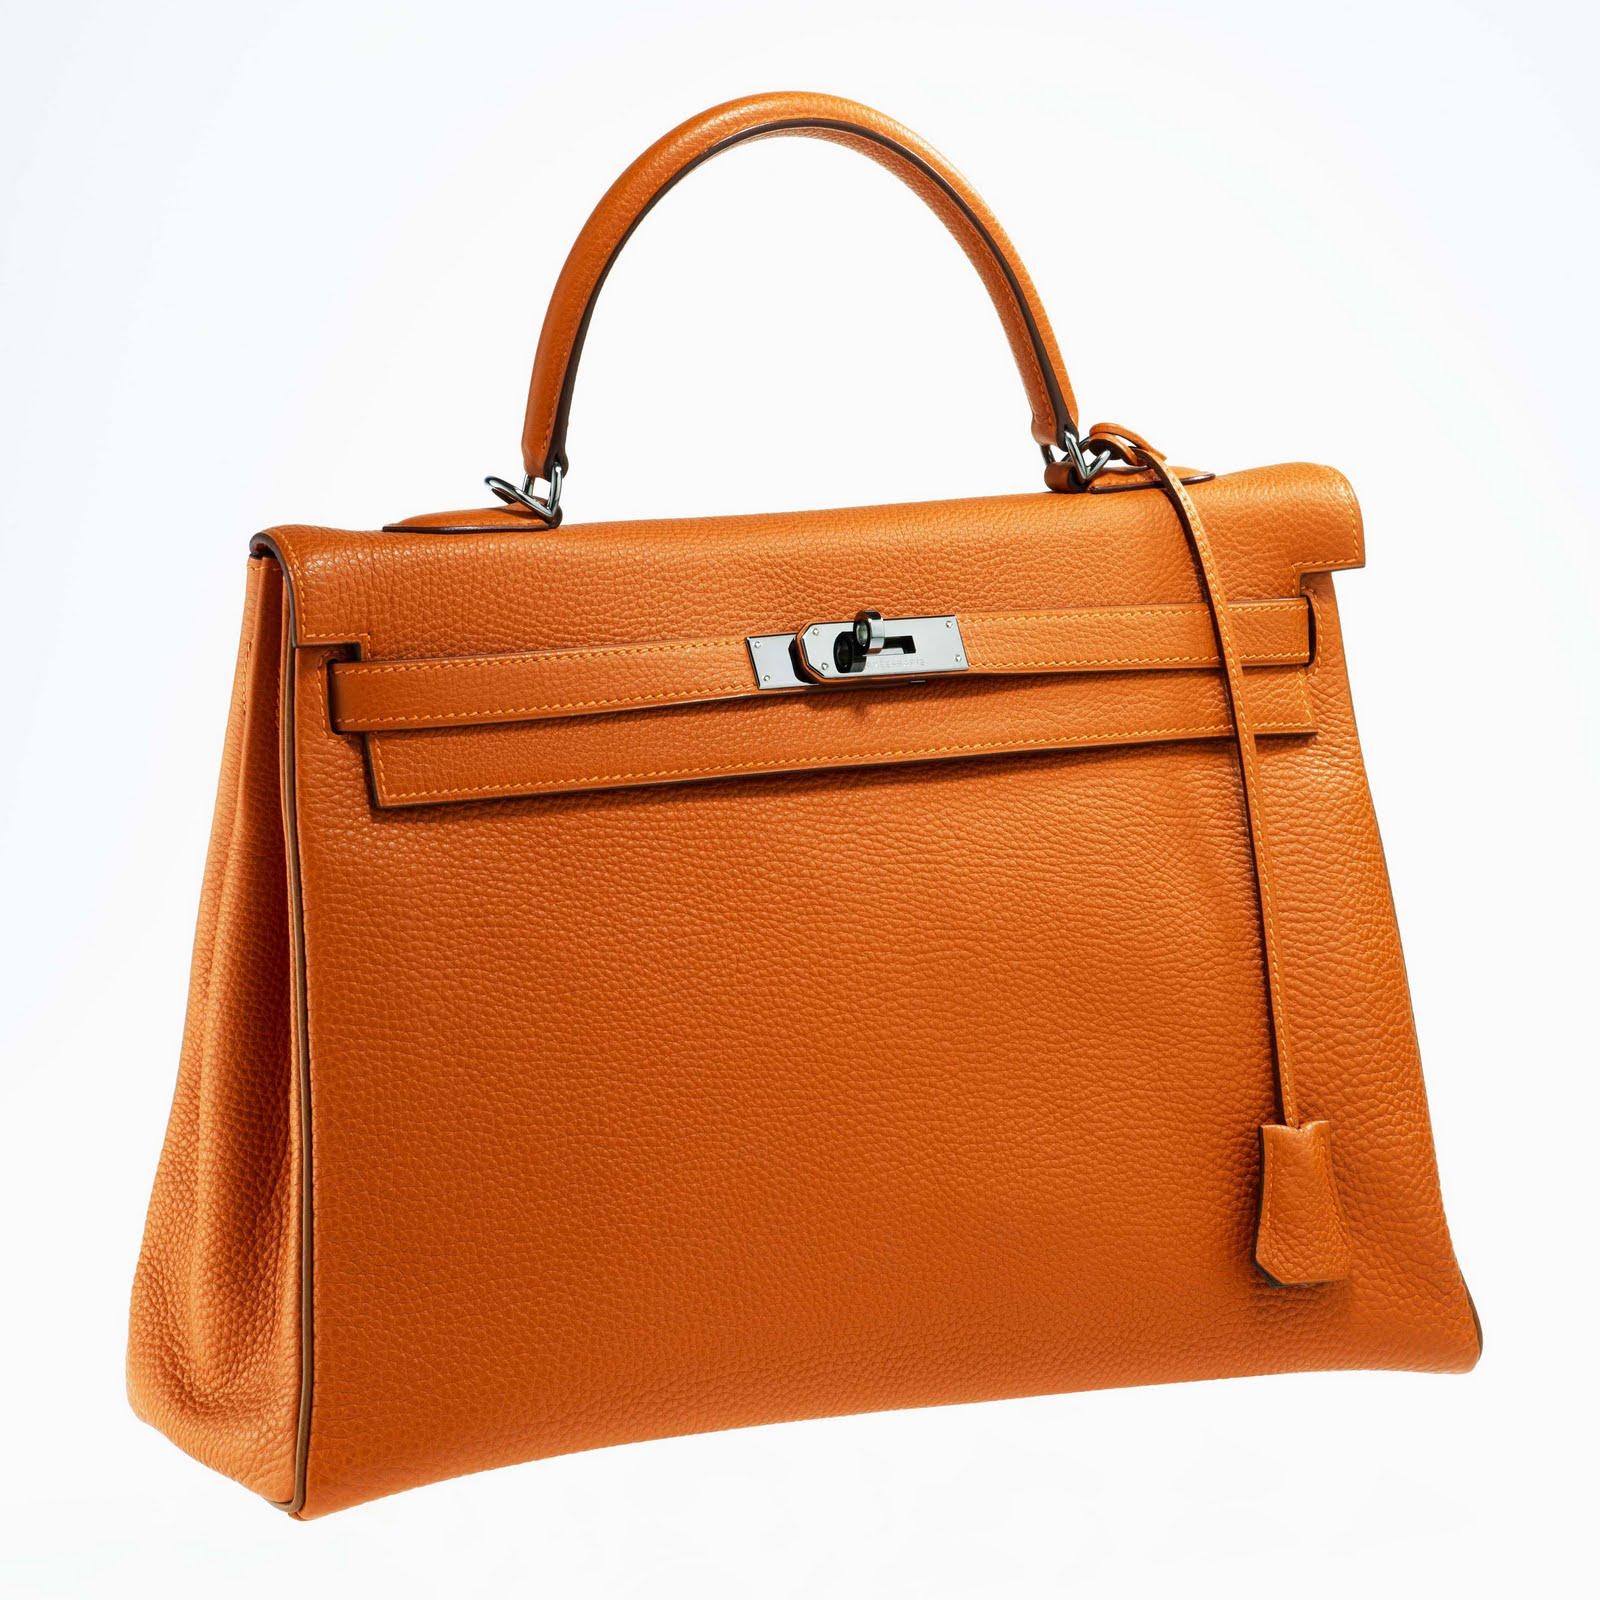 24460f9192a Hermes Kelly Bag